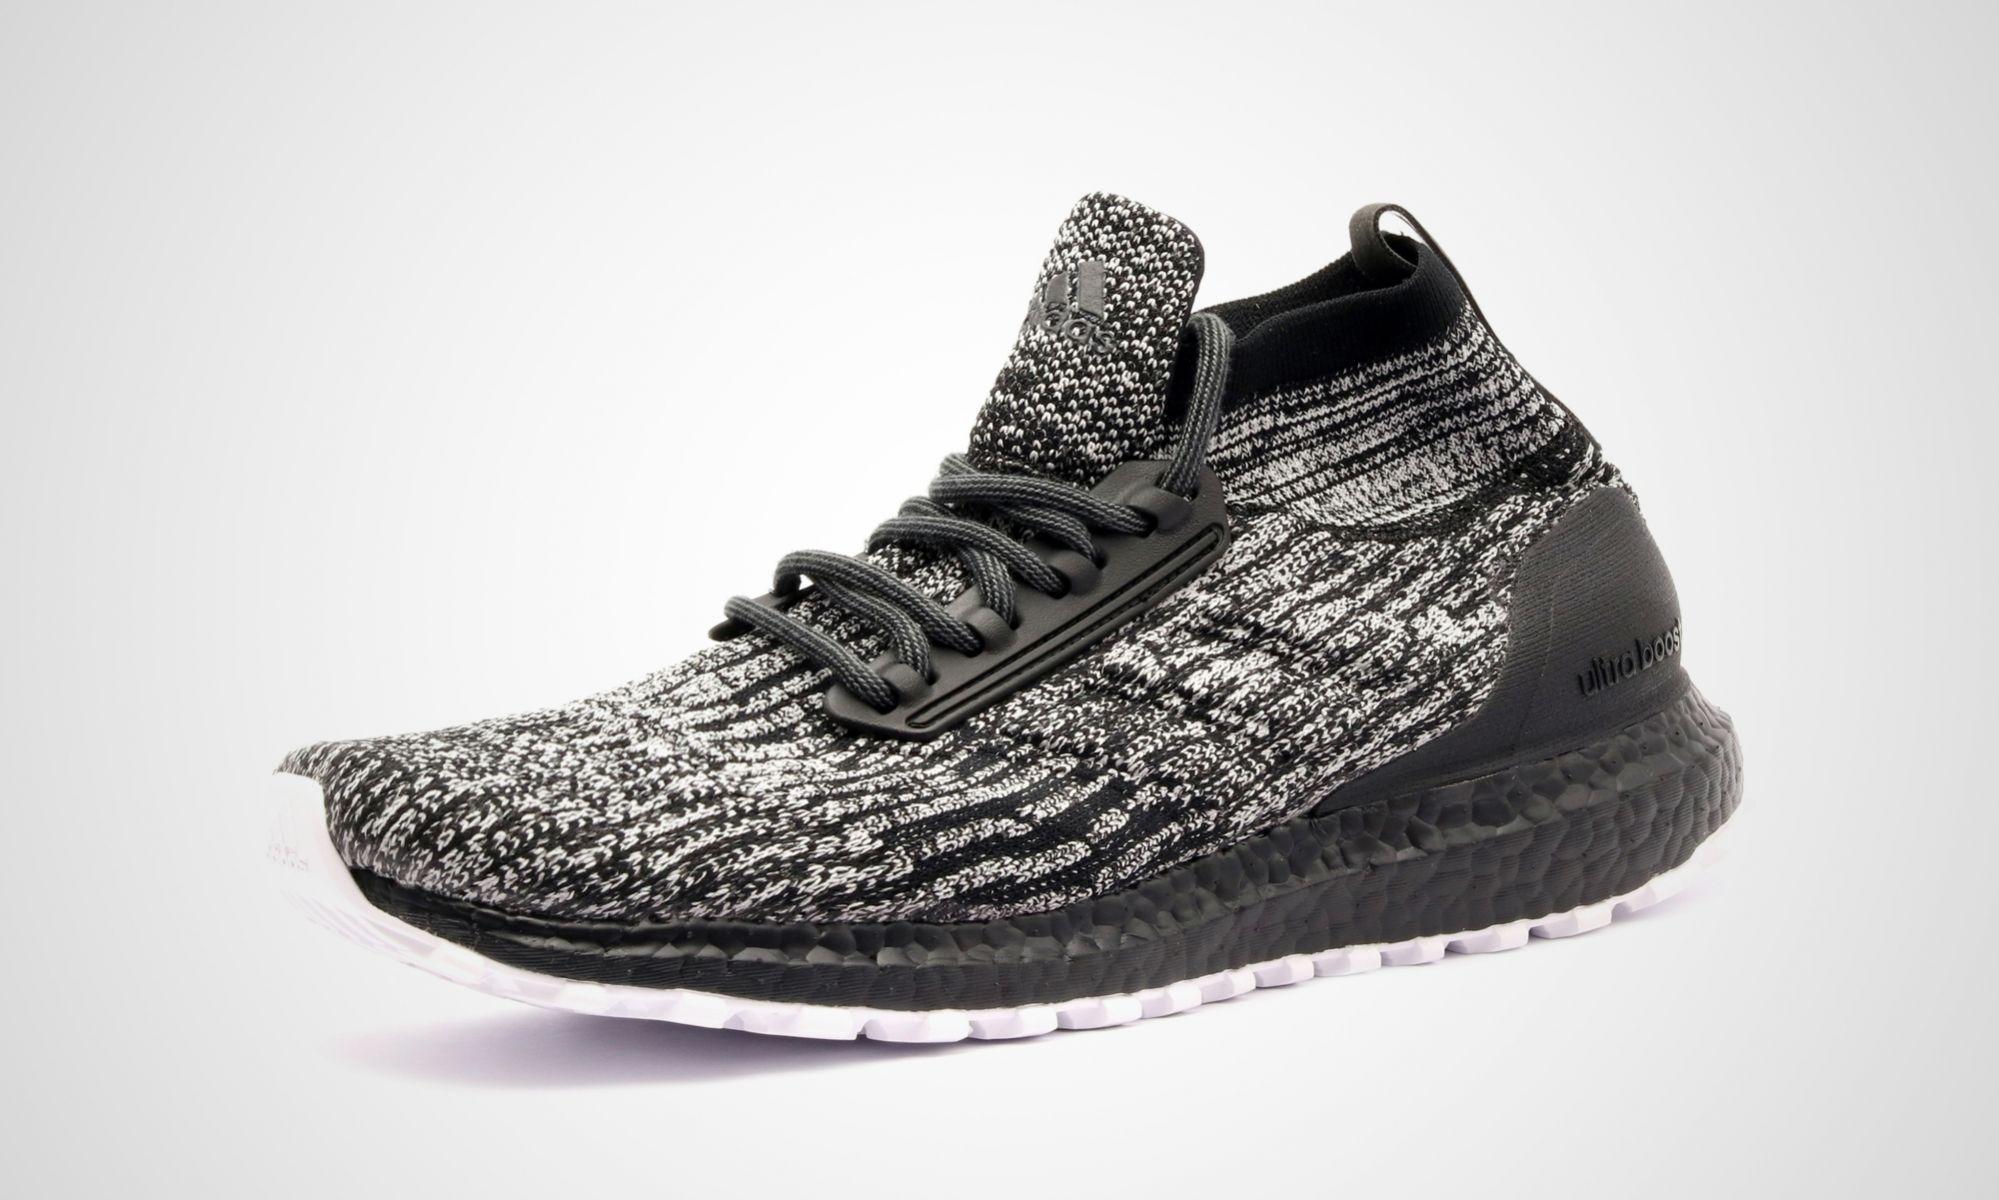 adidas ultra boost atr ltd black dead stock sneakerblog. Black Bedroom Furniture Sets. Home Design Ideas